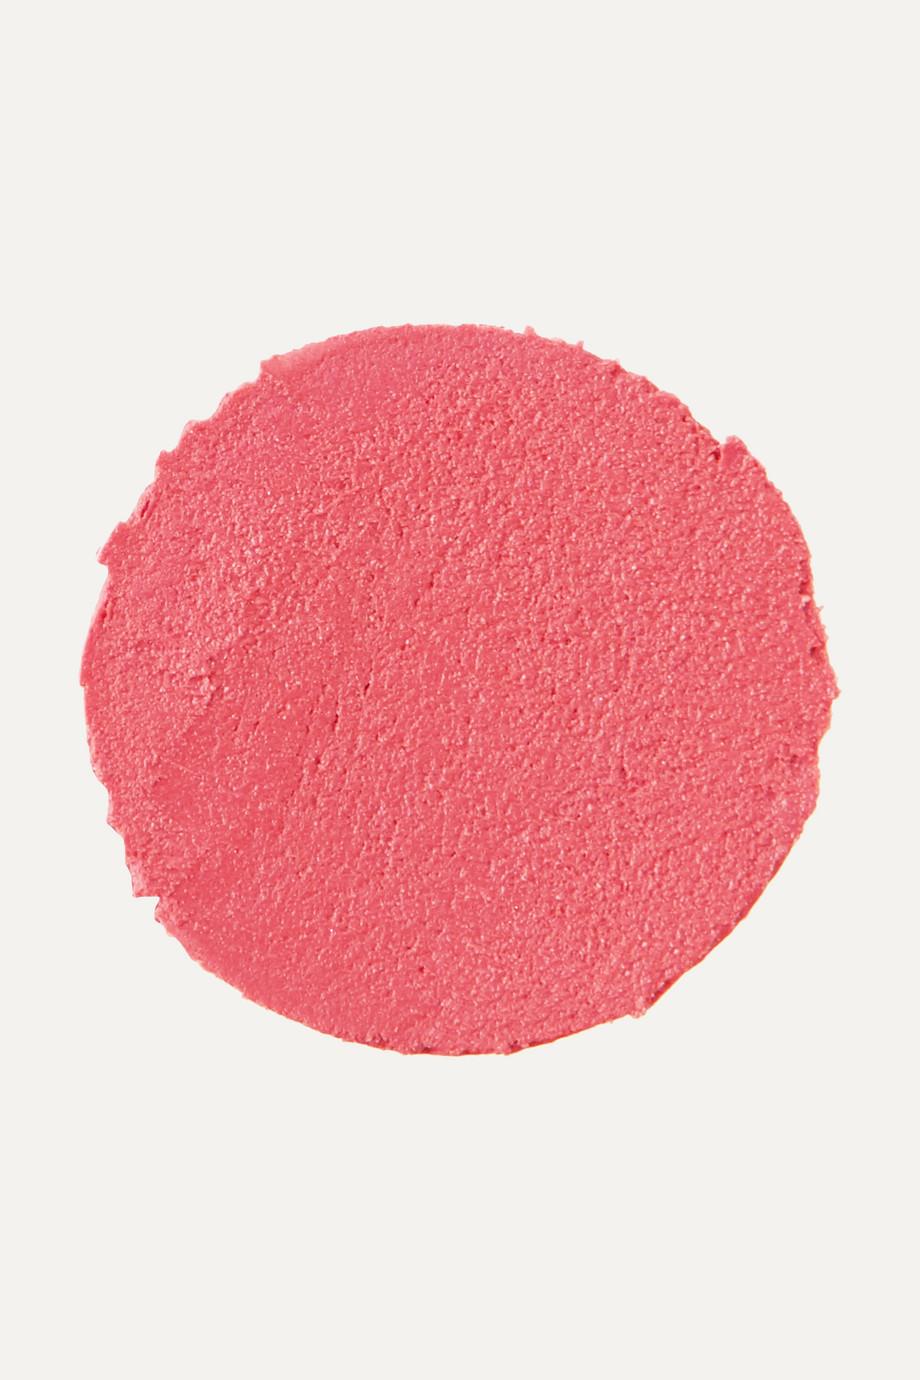 Bobbi Brown Crushed Lip Color - Cabana